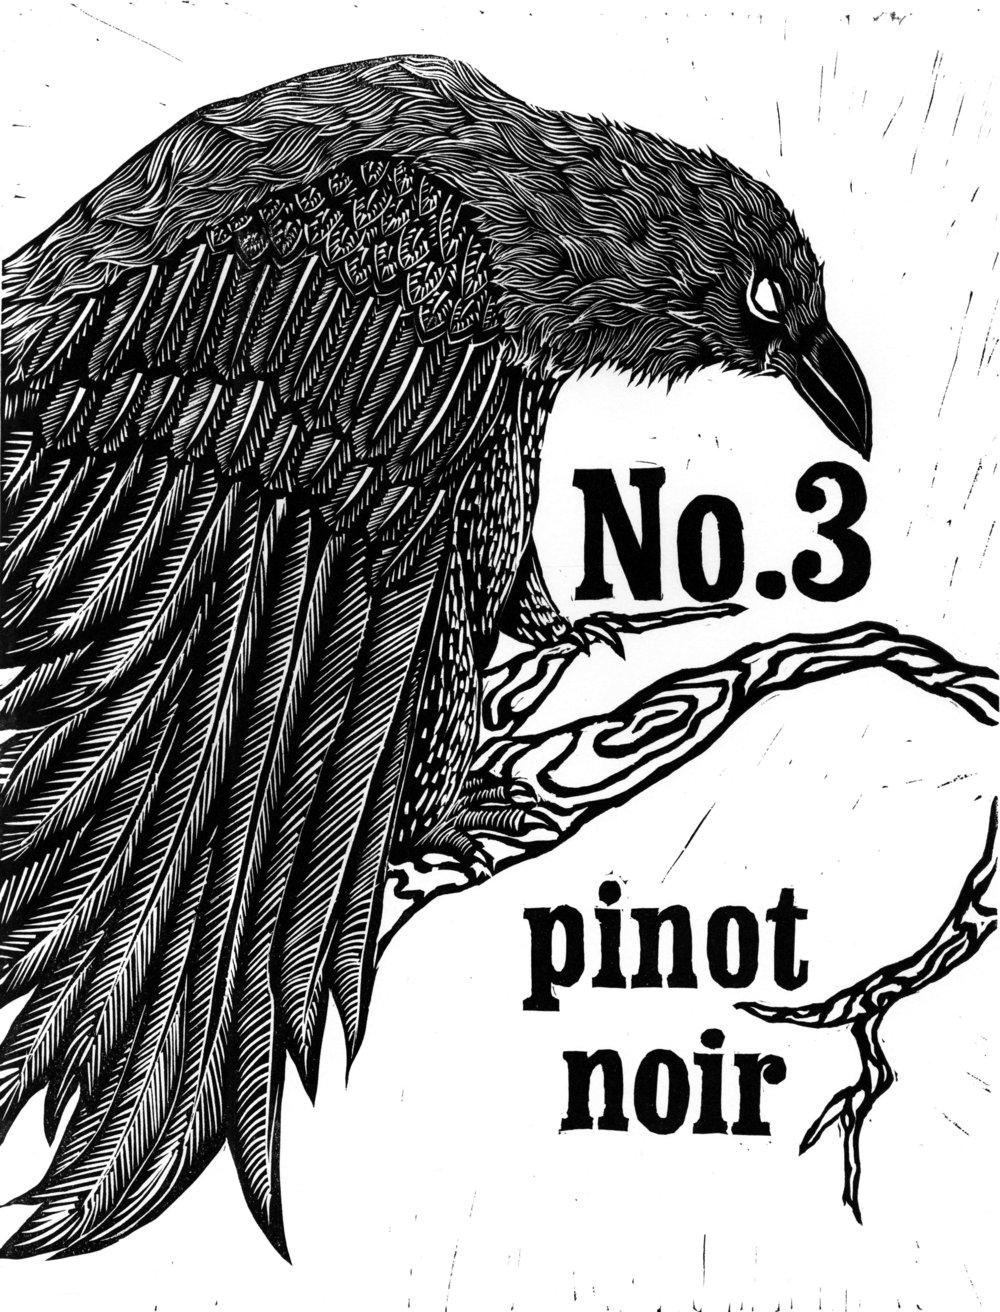 pinotnoir_300dpi.jpg